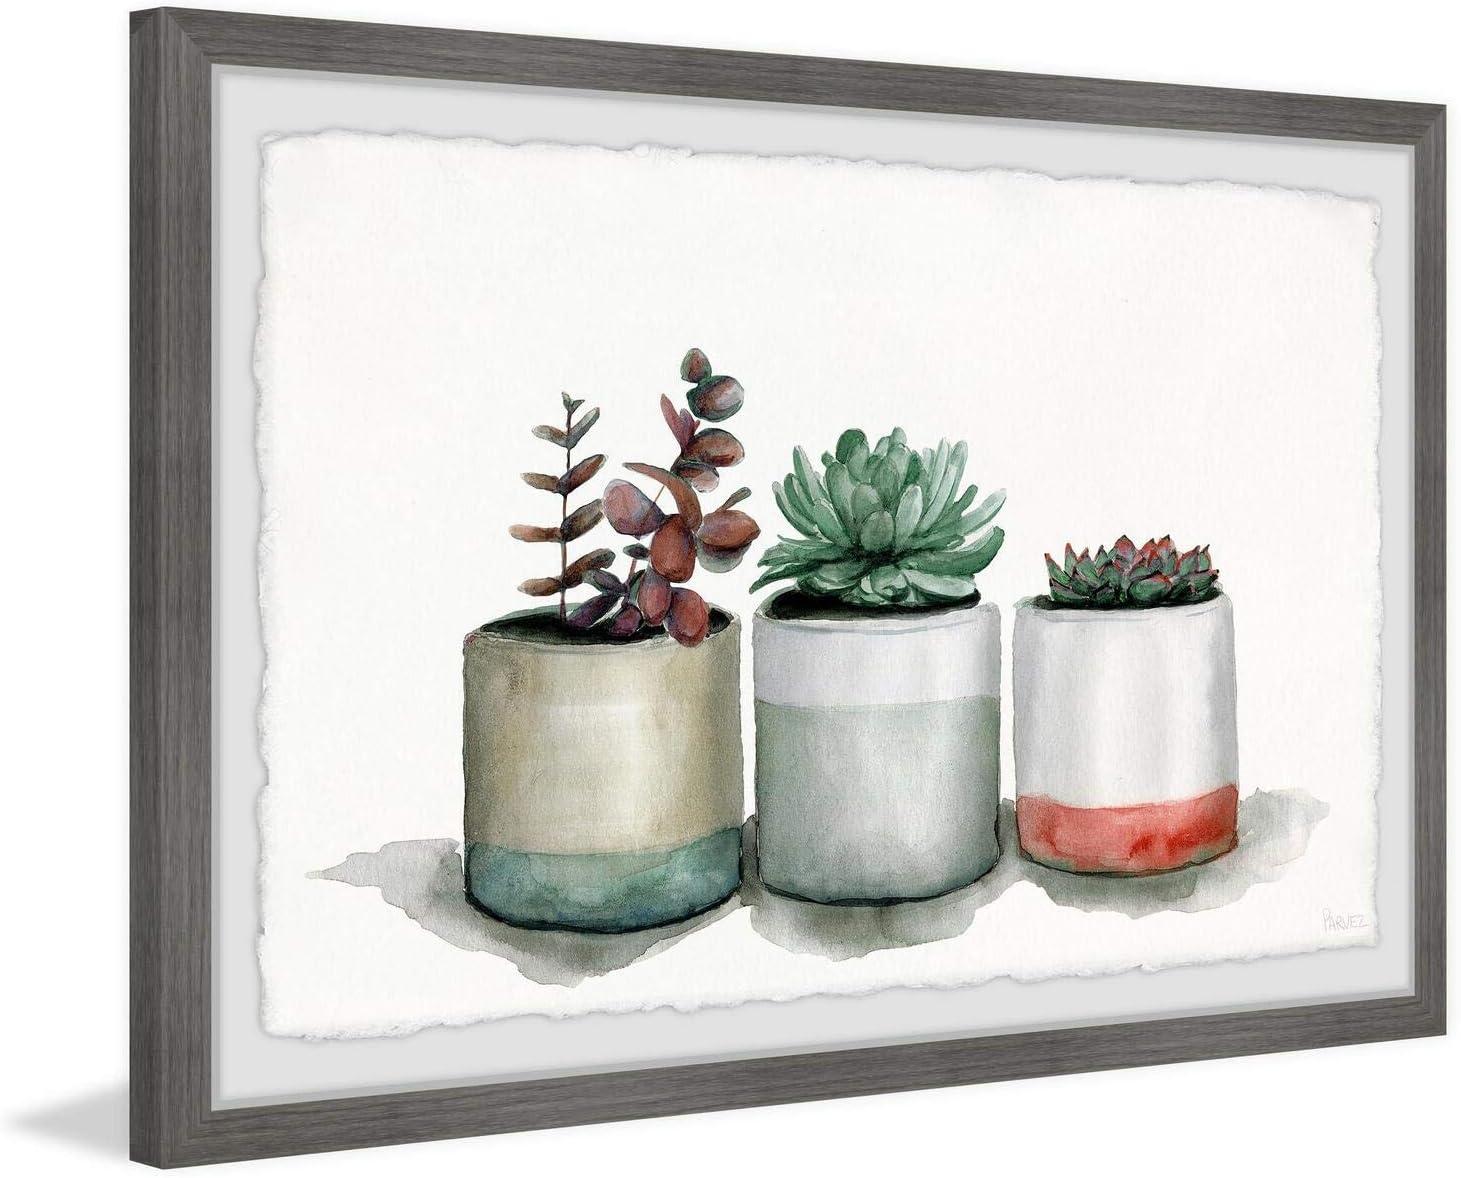 Parvez Taj Award Triple Cactus Limited time cheap sale Line Framed Print x 20